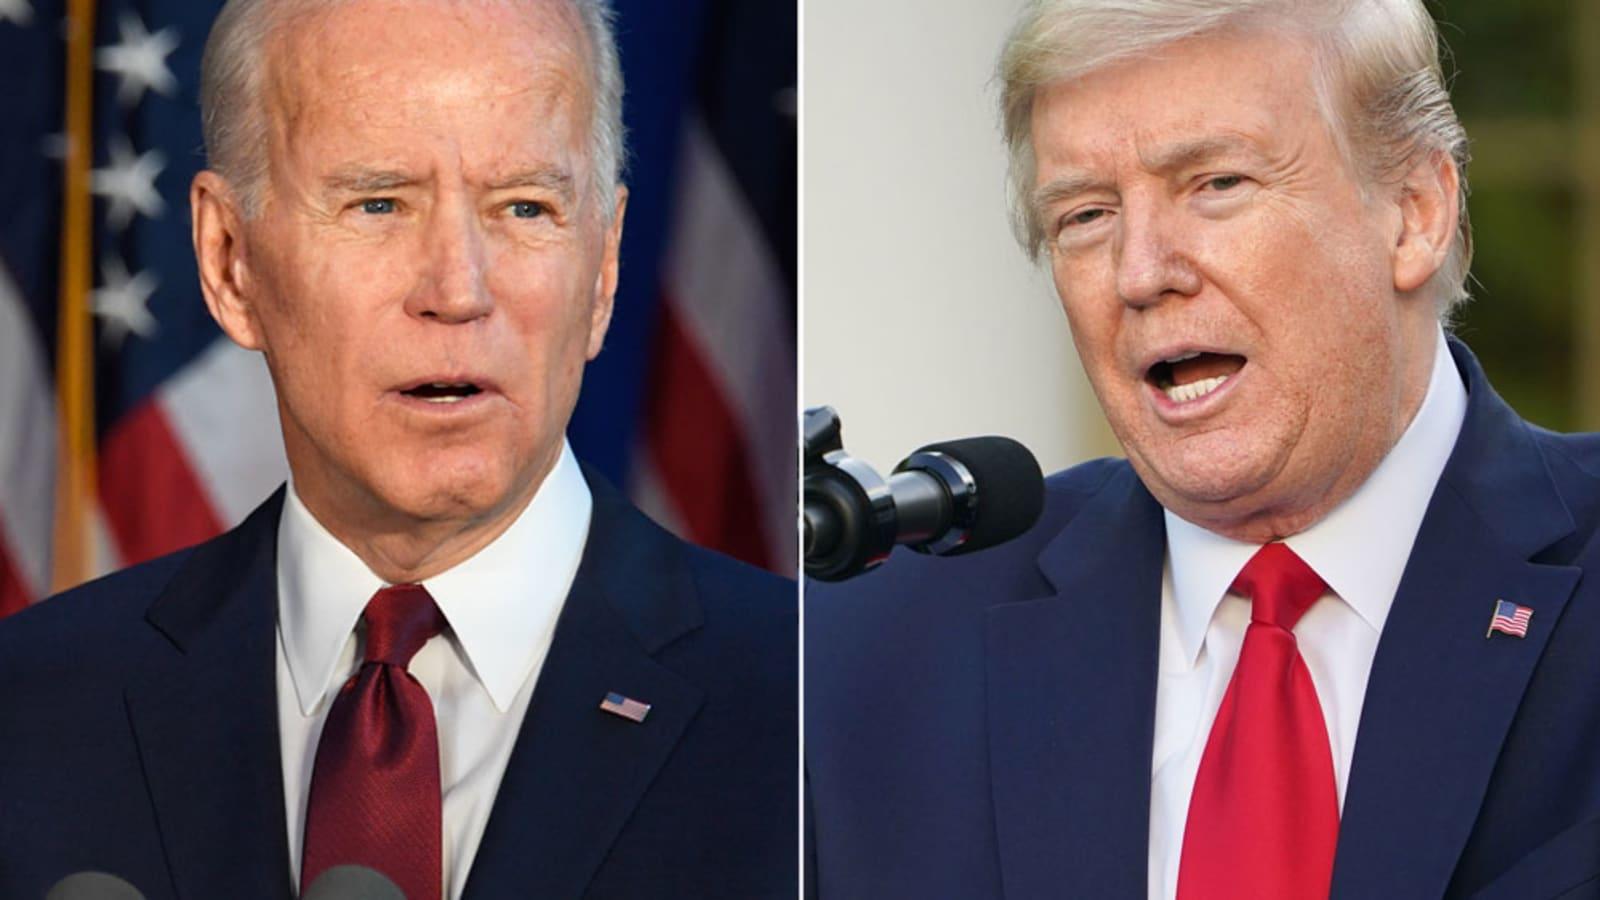 Second presidential debate between Biden, Trump officially canceled